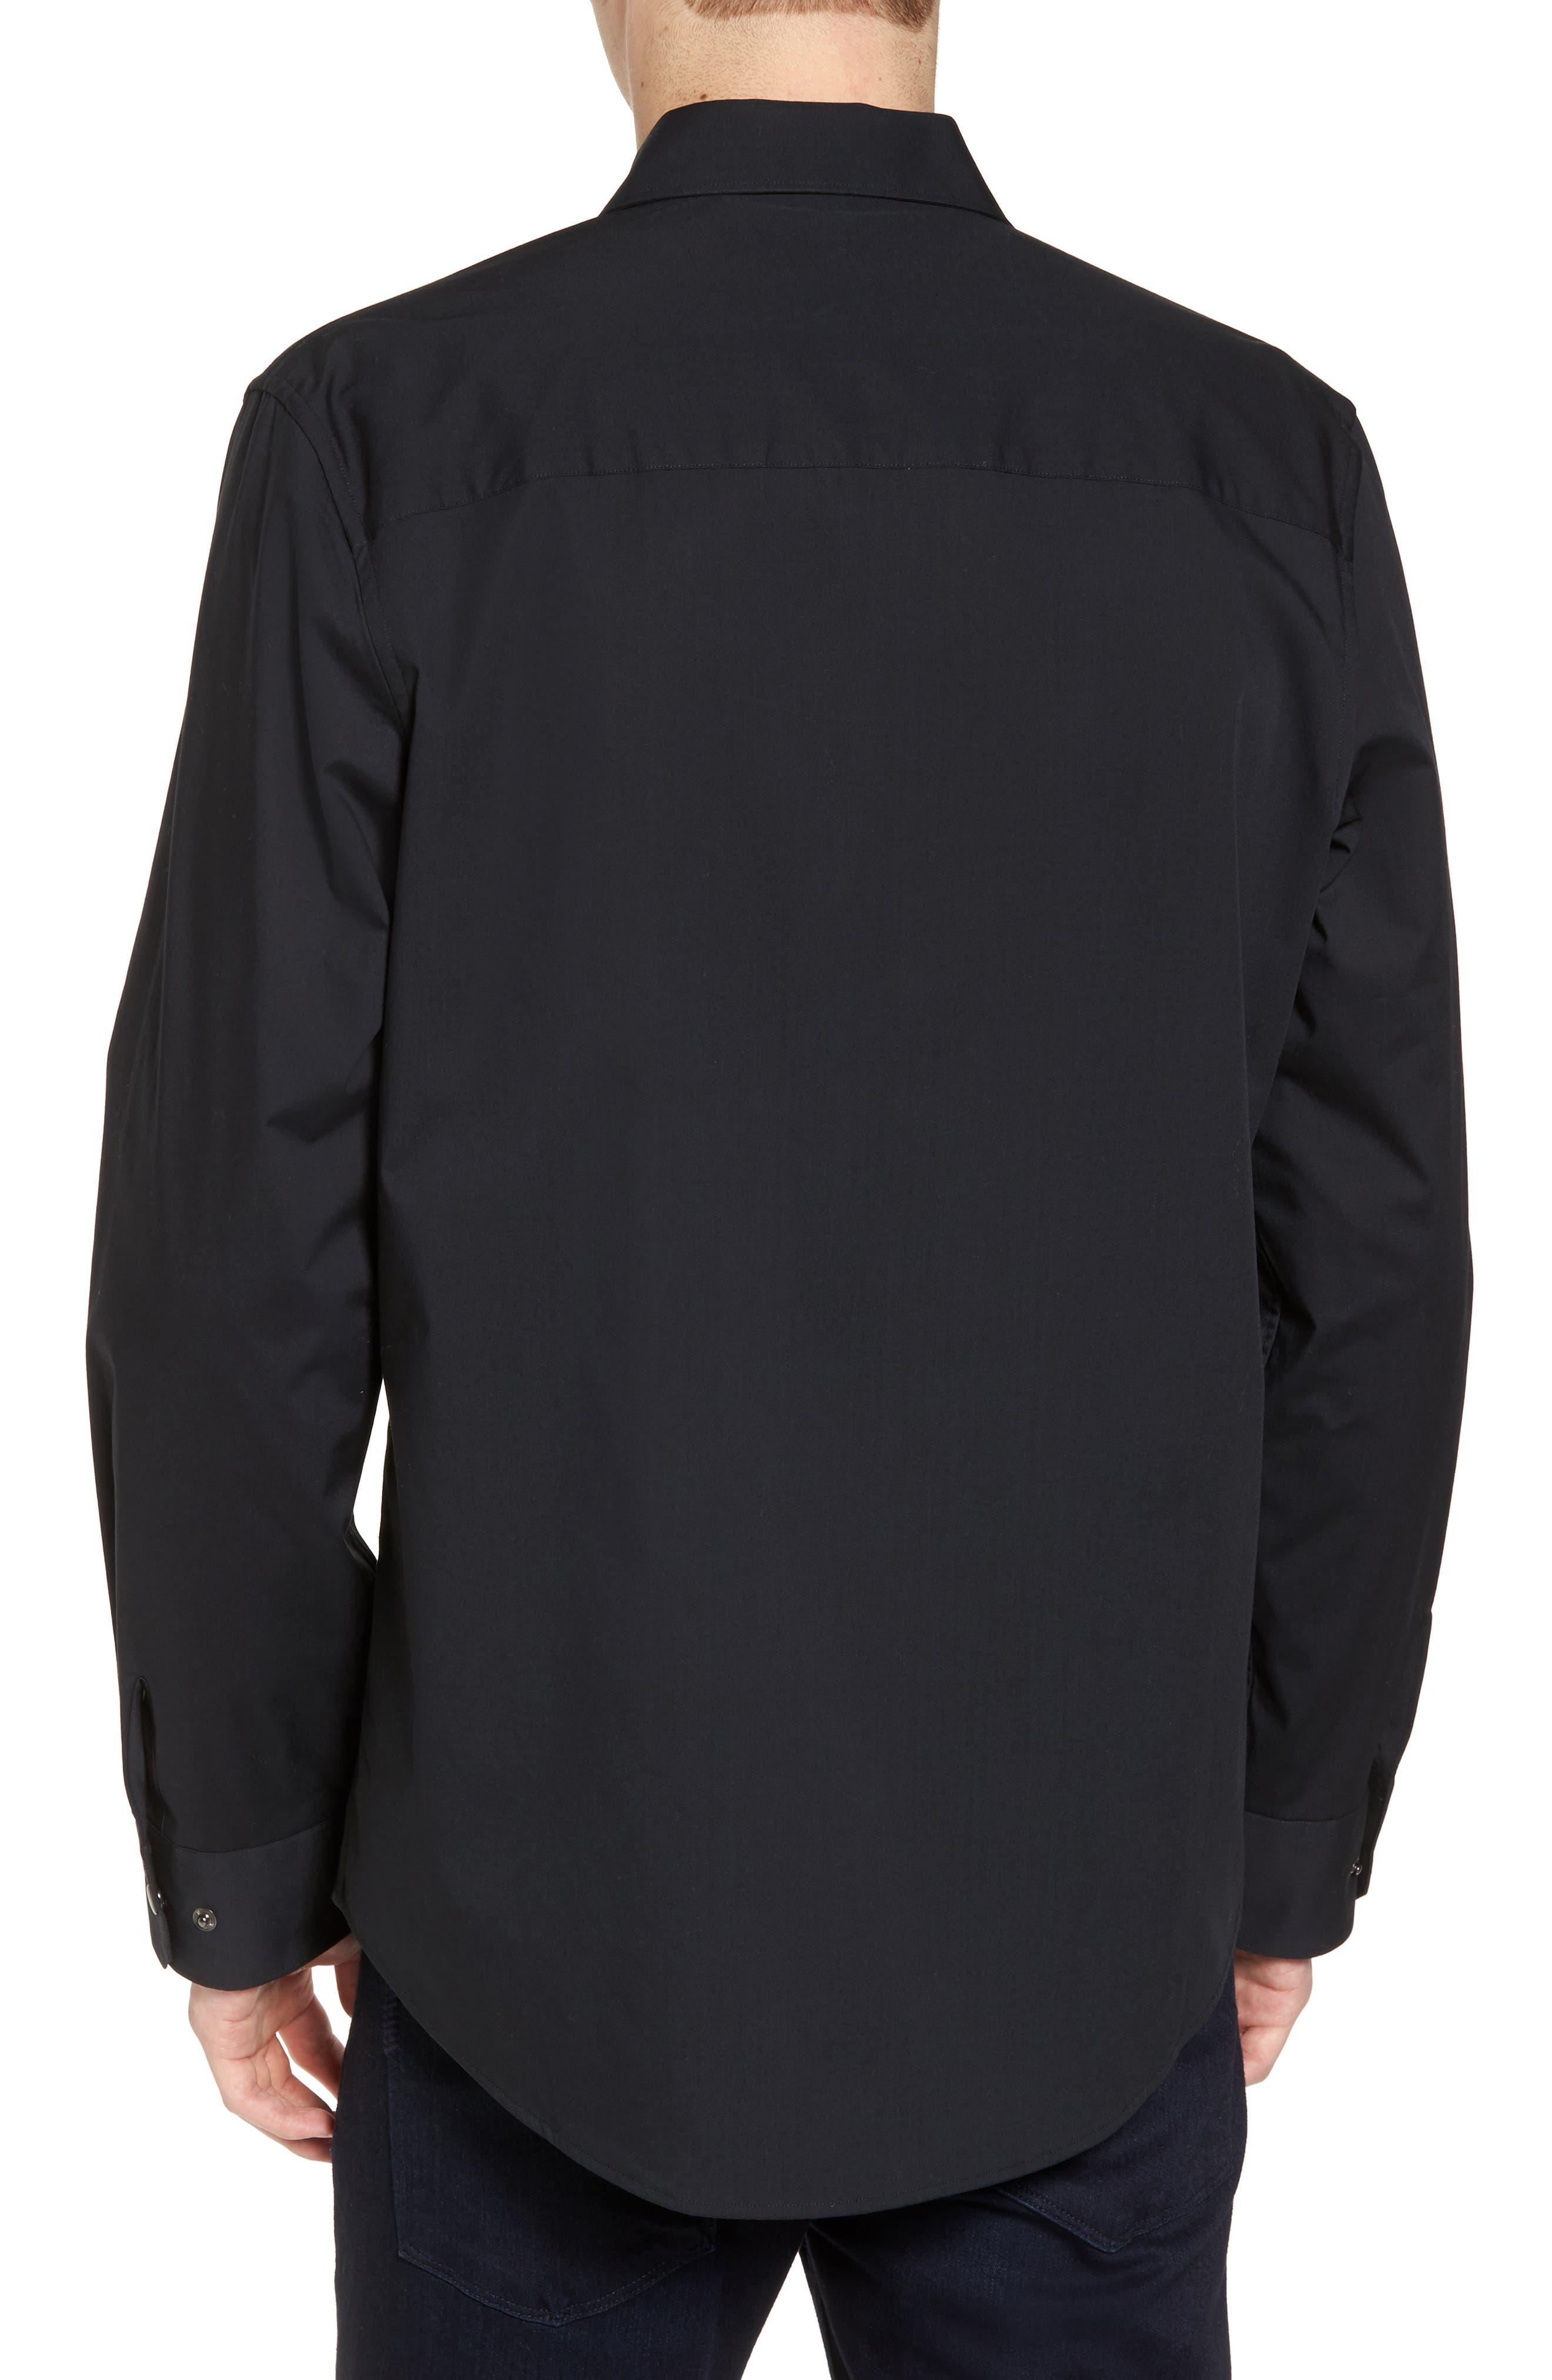 Zip Shirt Jacket,                             Alternate thumbnail 2, color,                             Black